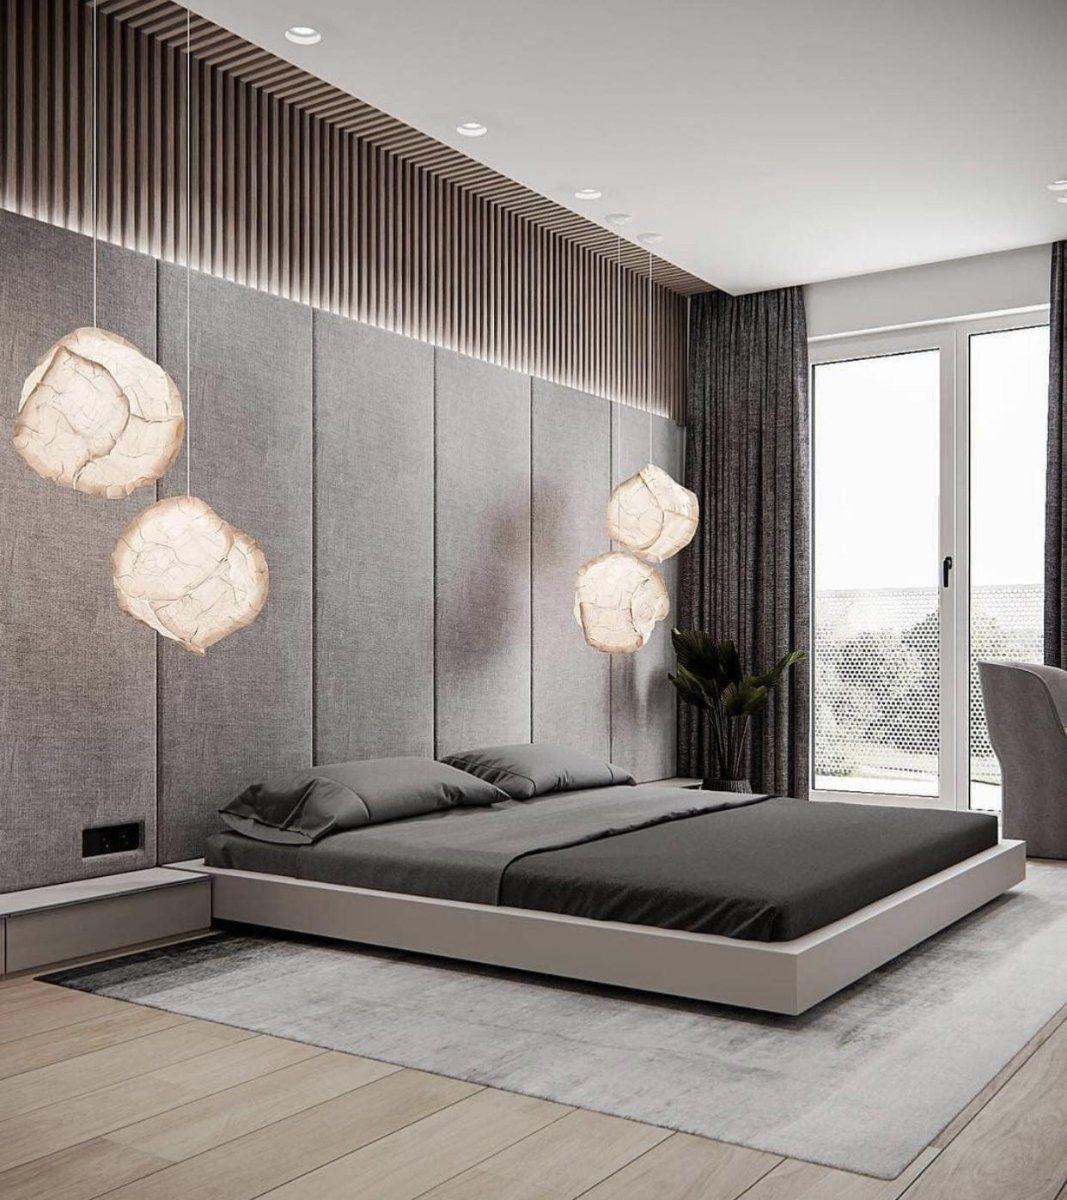 Bedroom A Quiet Retreat Design Studio D2 Modern Master Bedroom Design Apartment Interior Design Apartment Interior Luxury master bedroom example